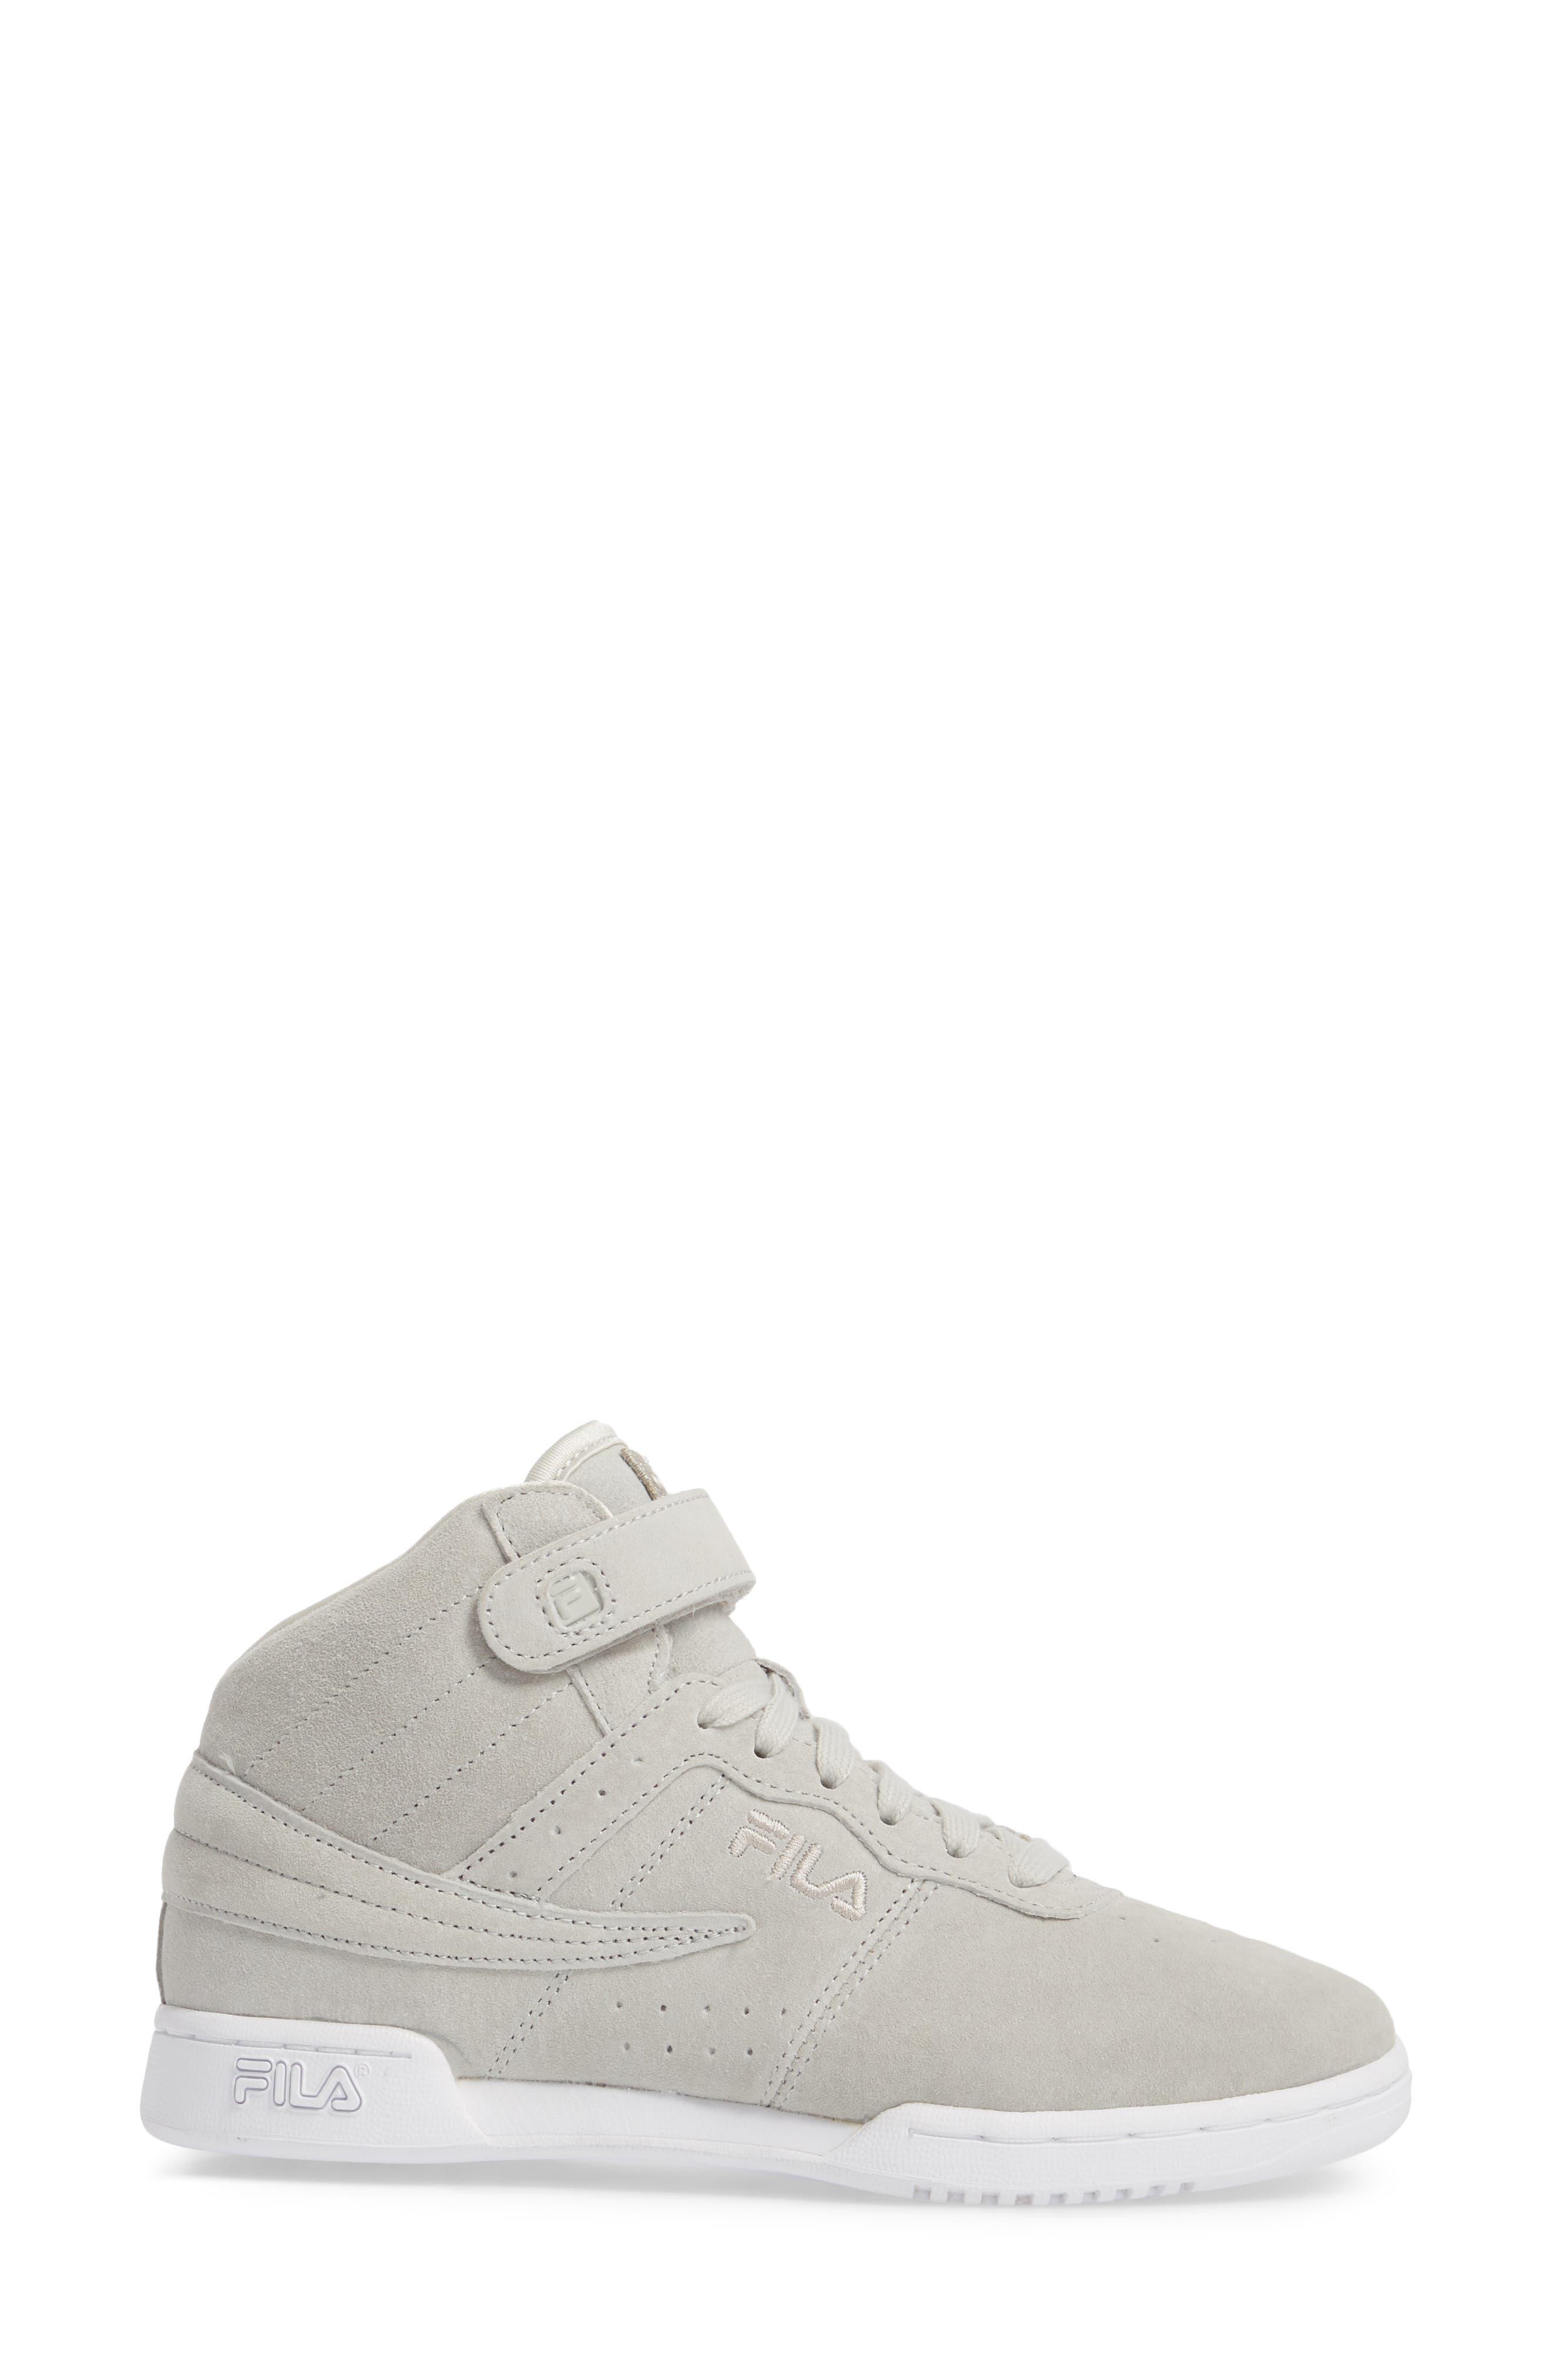 F-13 Premium Mid Top Sneaker,                             Alternate thumbnail 3, color,                             White